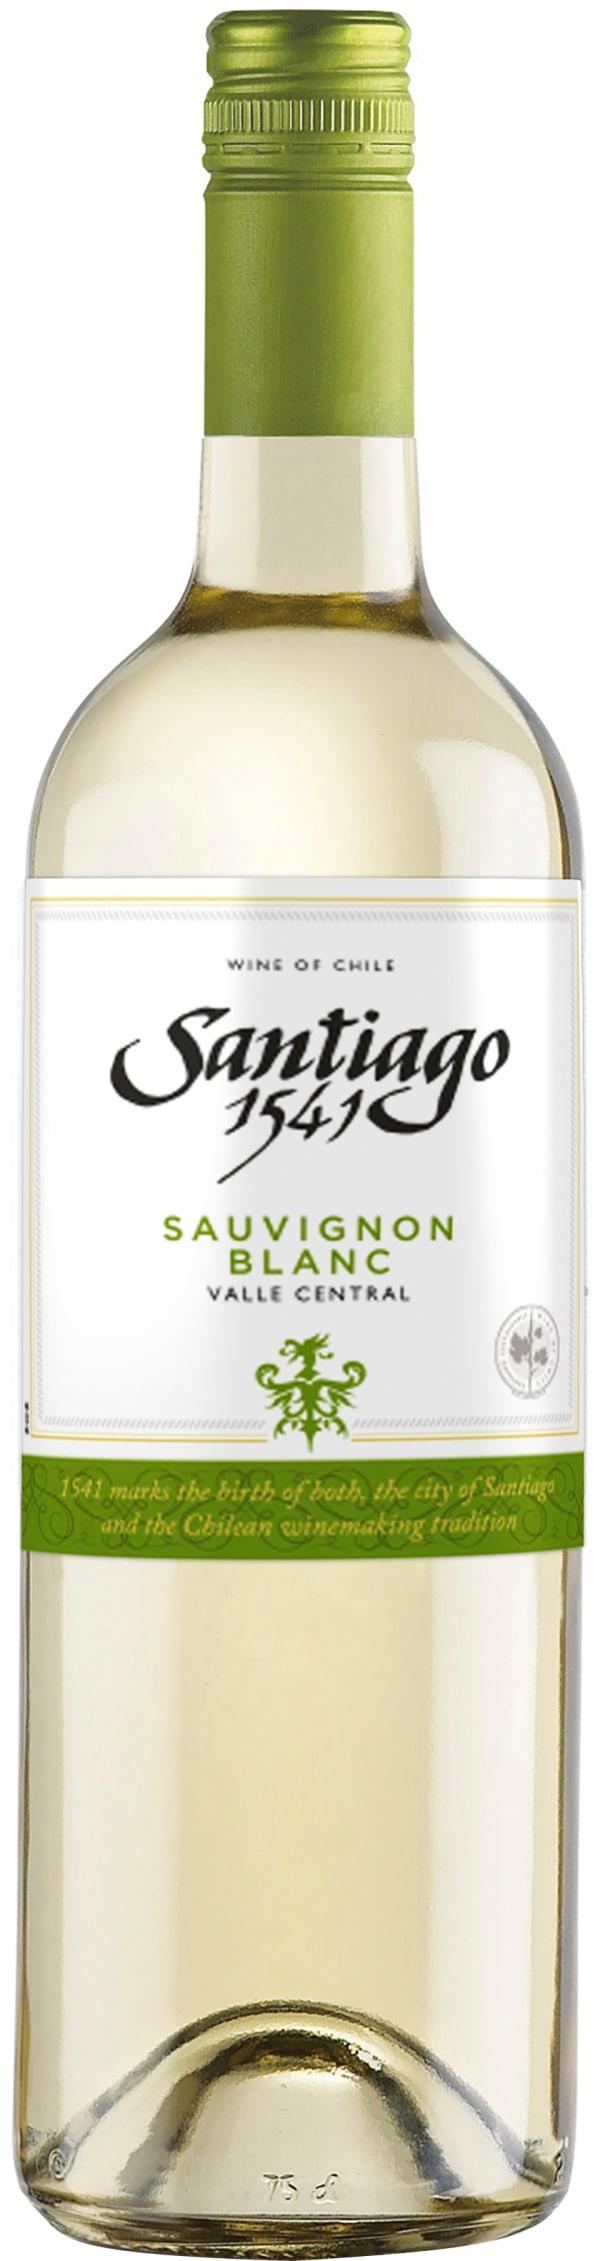 Santiago 1541 Sauvignon Blanc 2018